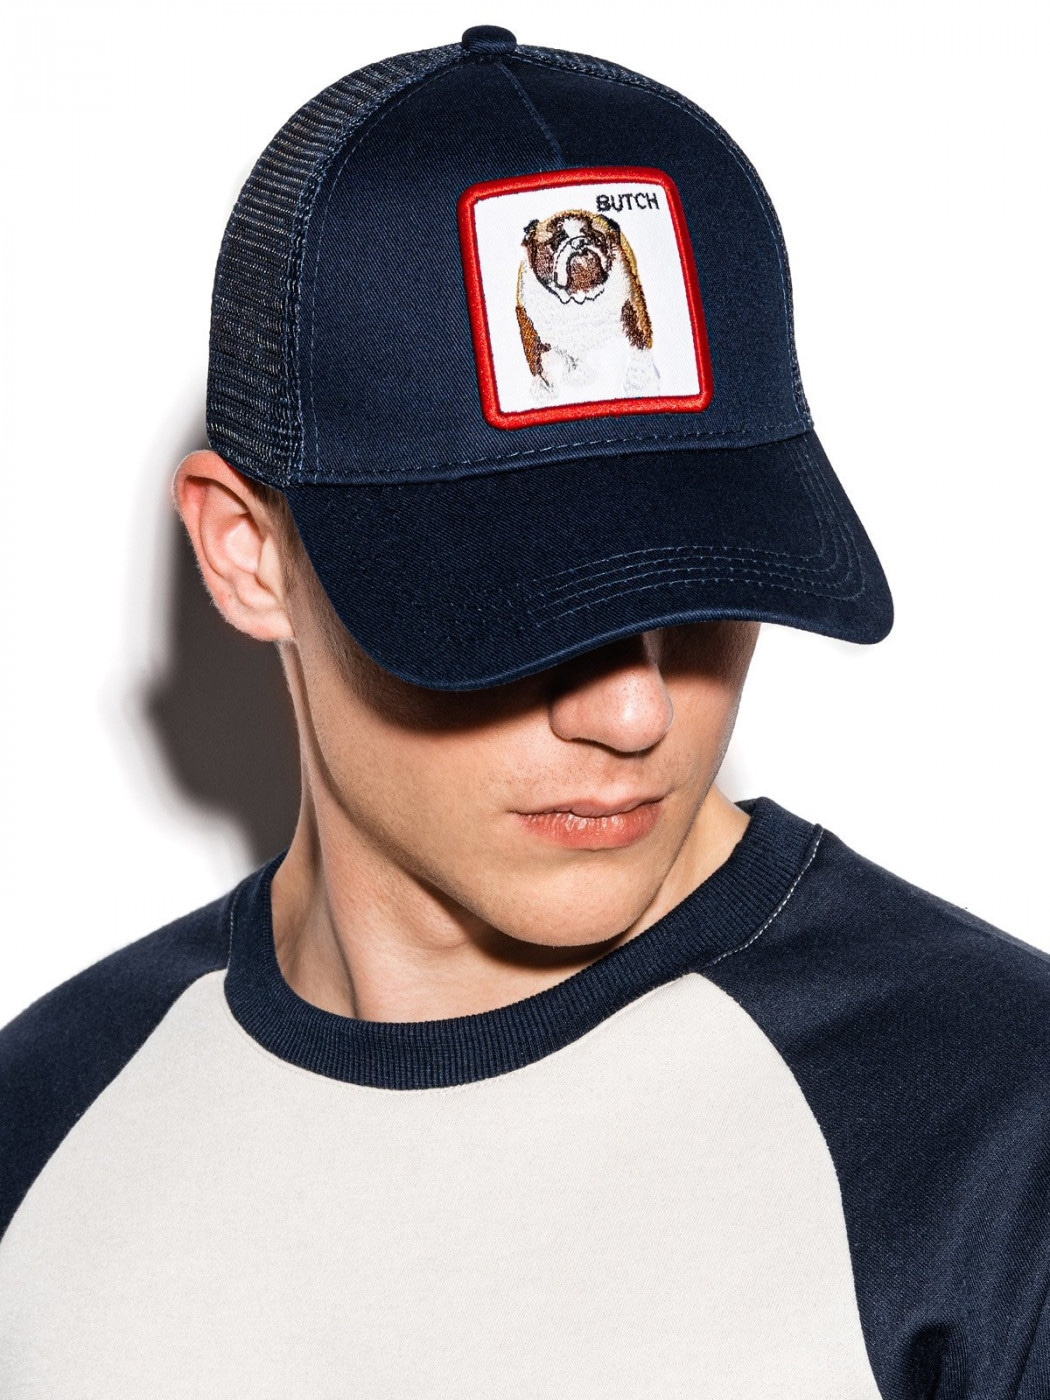 Ombre Clothing Men's cap H071